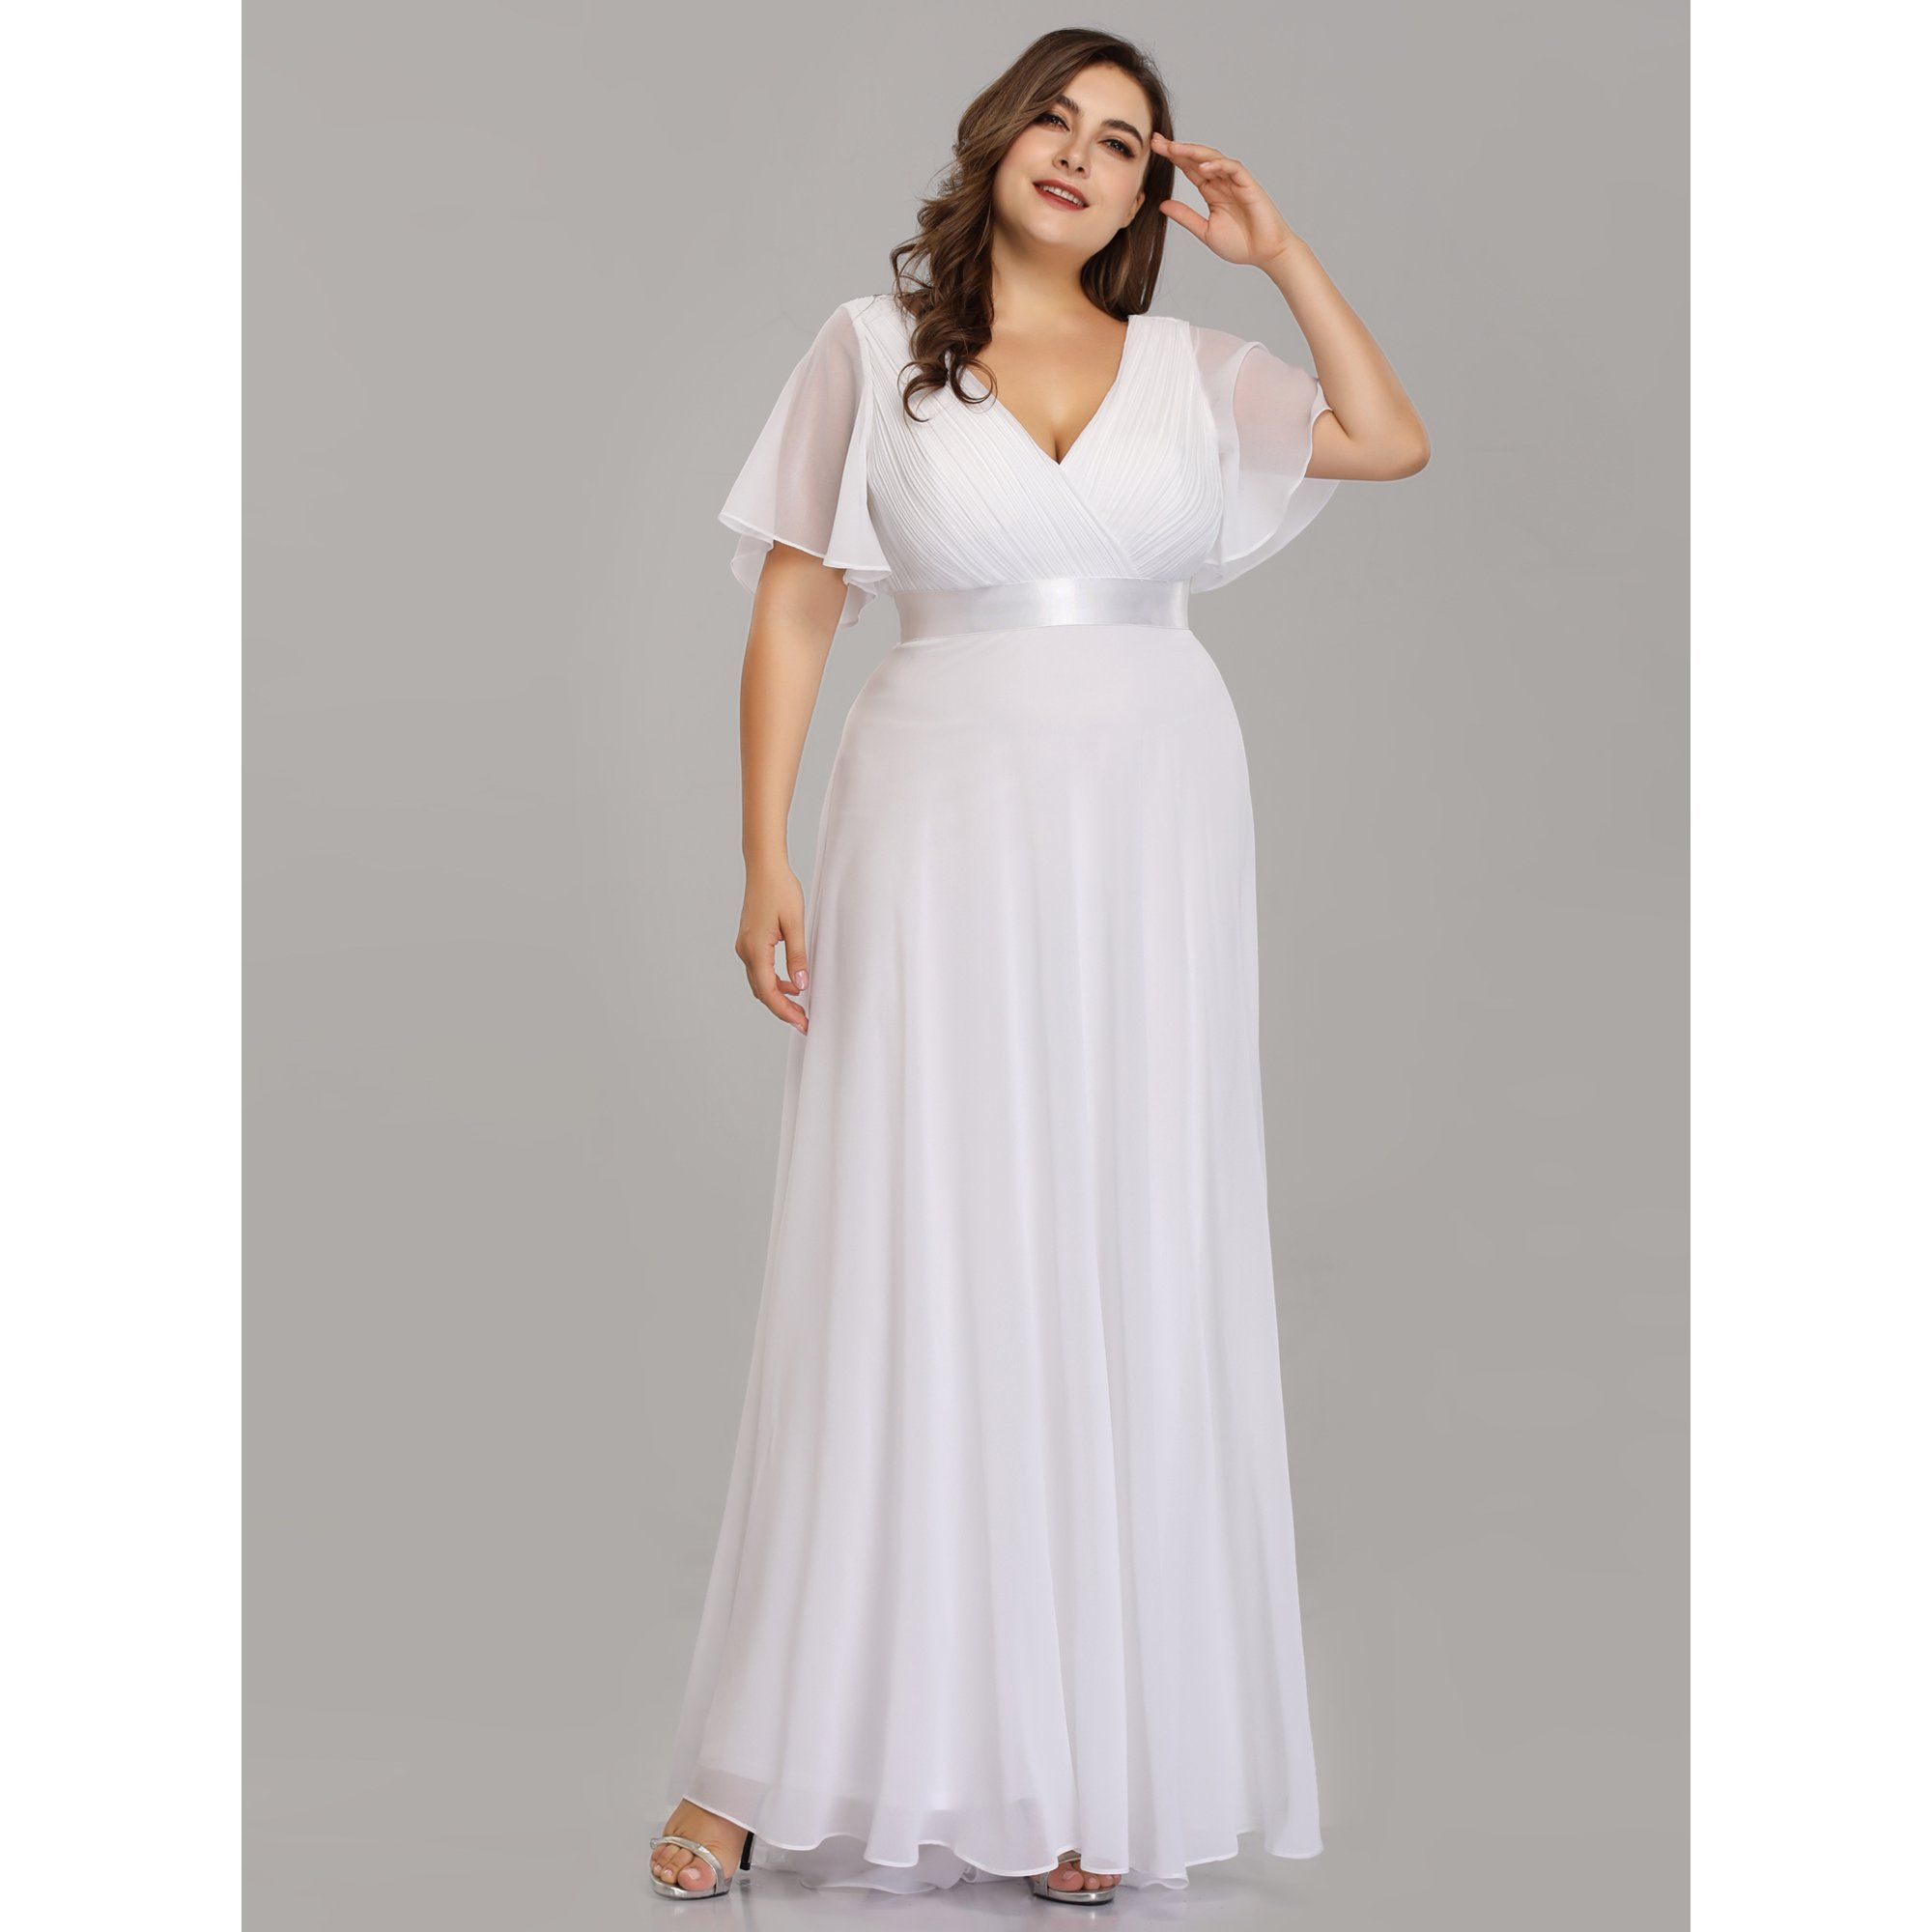 Ever Pretty Ever Pretty Womens Chiffon Long Prom Cocktail Dresses For Wome Bridesmaid Dresses Plus Size Empire Waist Evening Dress Empire Waist Wedding Dress [ 2000 x 2000 Pixel ]